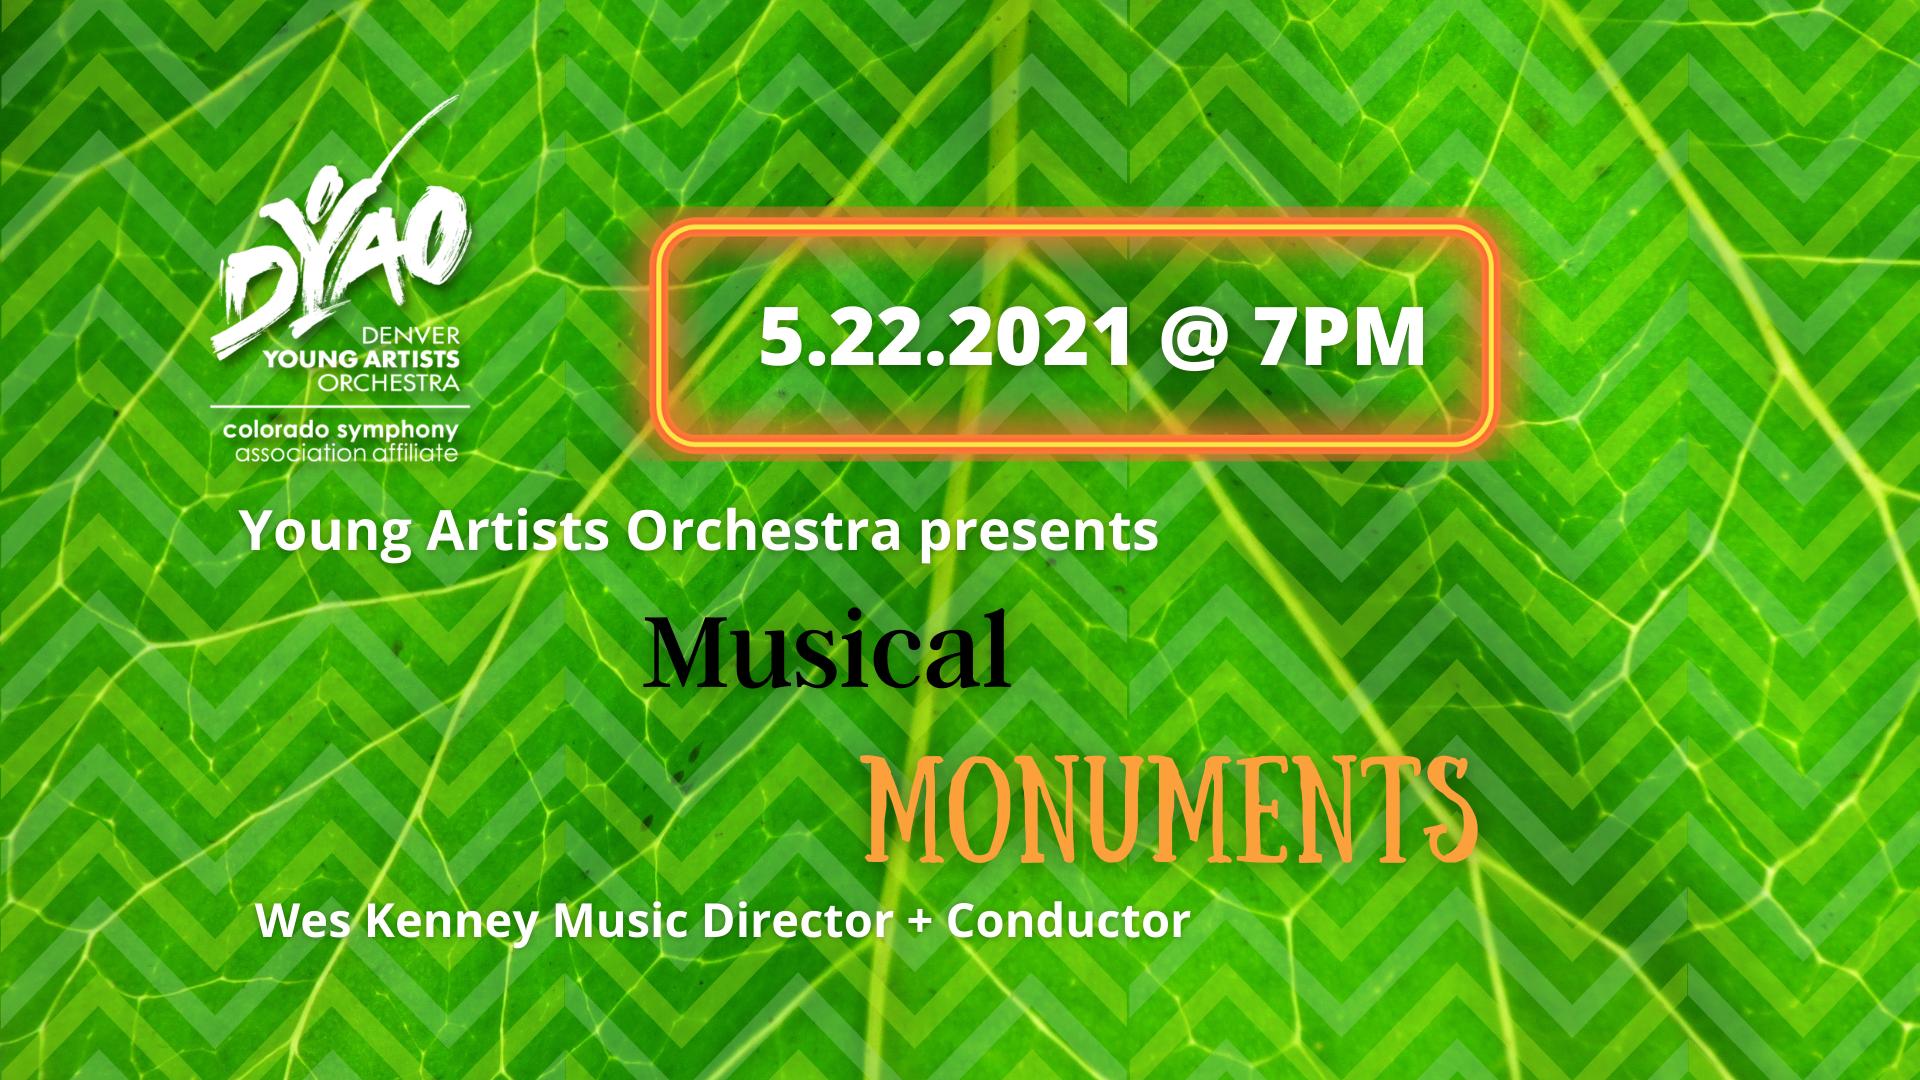 YAO Viritual Concert: Musical Monuments